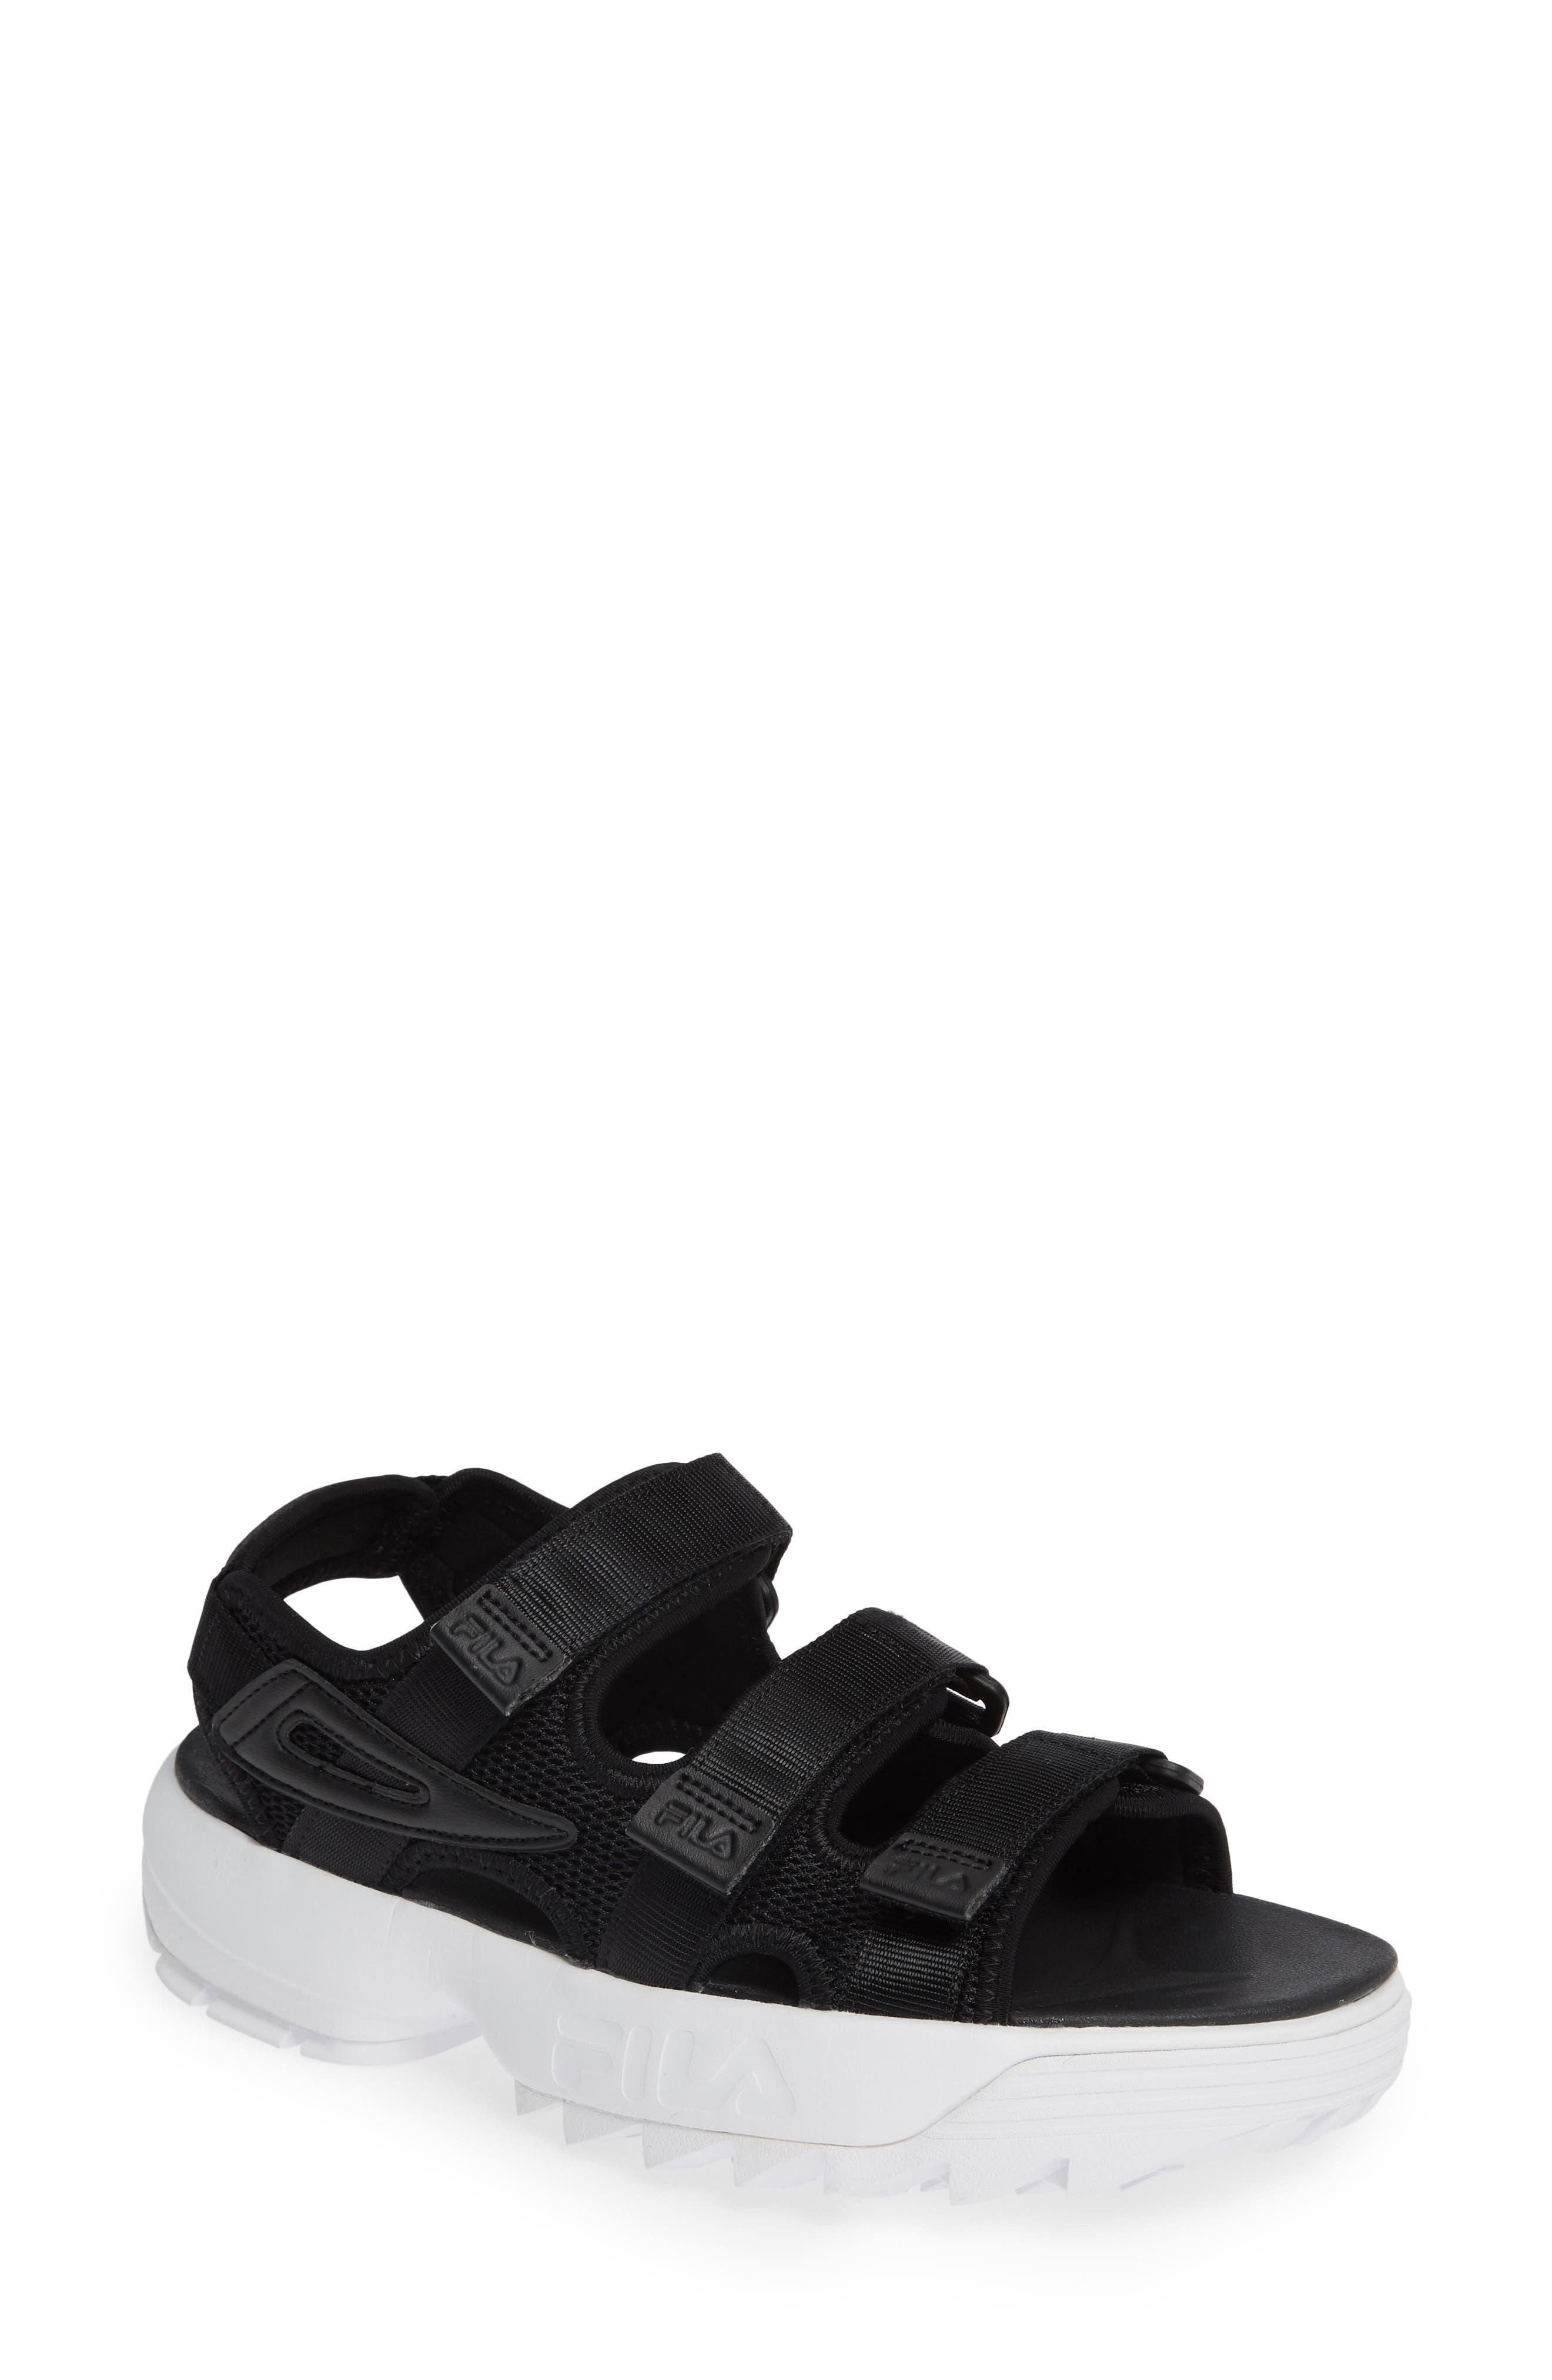 Disruptor Sandal,                         Main,                         color, BLACK/ BLACK/ WHITE